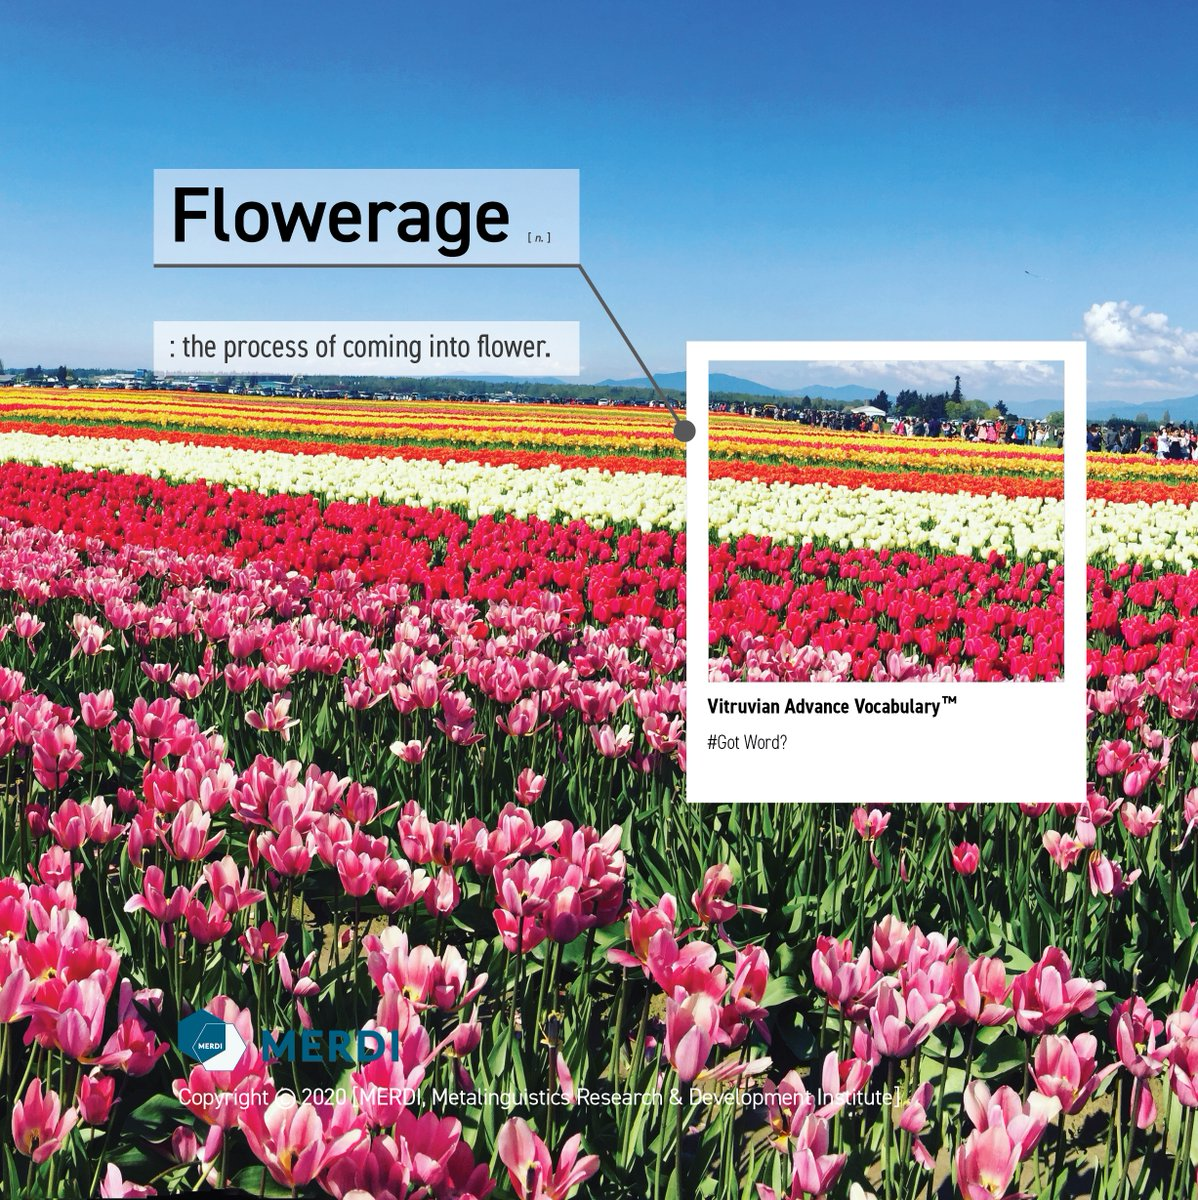 Flowerage [n.] : the process of coming into flower. Vitruvian Advance Vocabulary is based on innovative relational matrix and visualized vocabulary learning.  #Englishteacher #English #EnglishVocabulary #Vocabulary #Englishwords #ACT #SATprep #writingmotivation #englishwriting pic.twitter.com/p4pT9eotp4